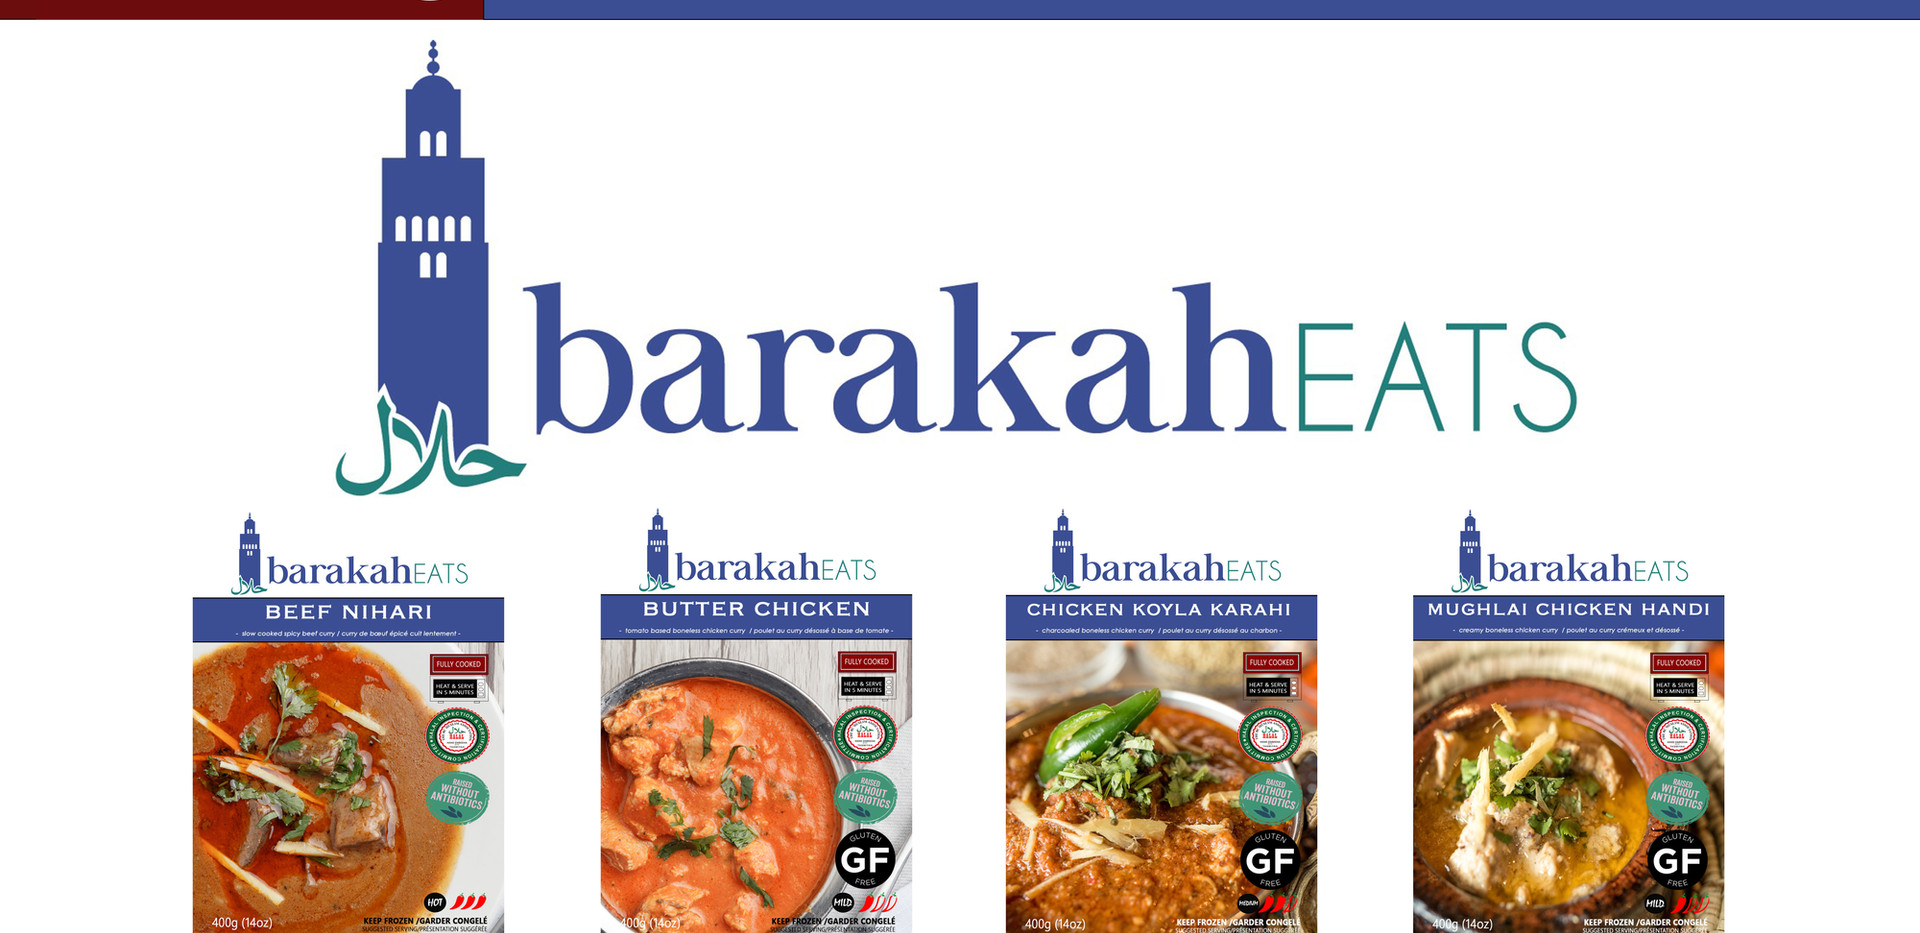 Barakah Eats.jpg